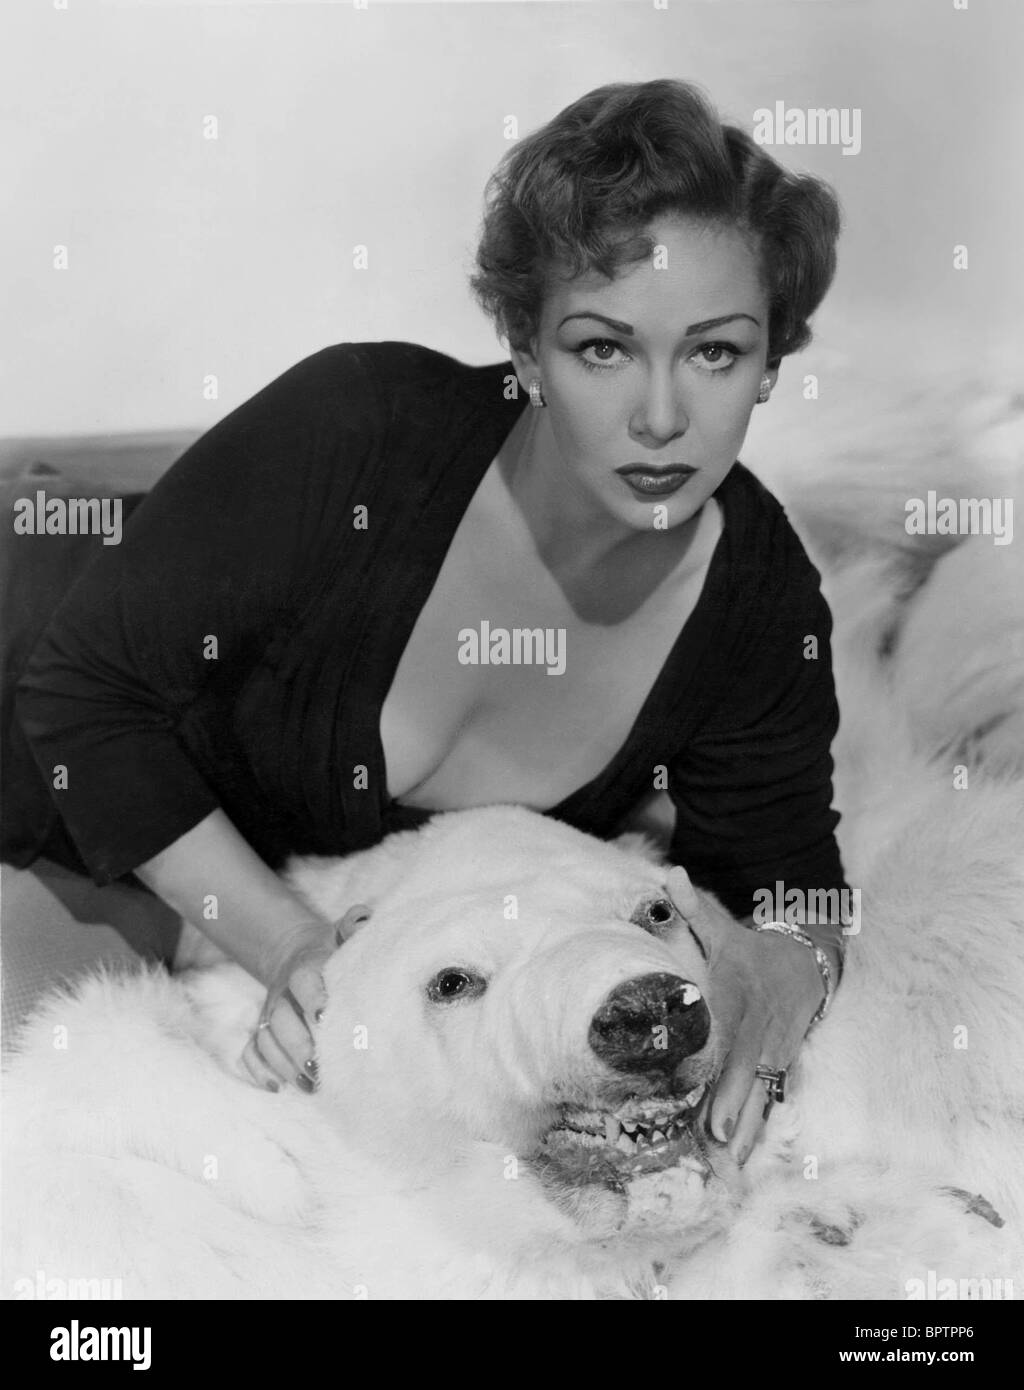 JEAN KENT SCHAUSPIELERIN (1955) Stockbild